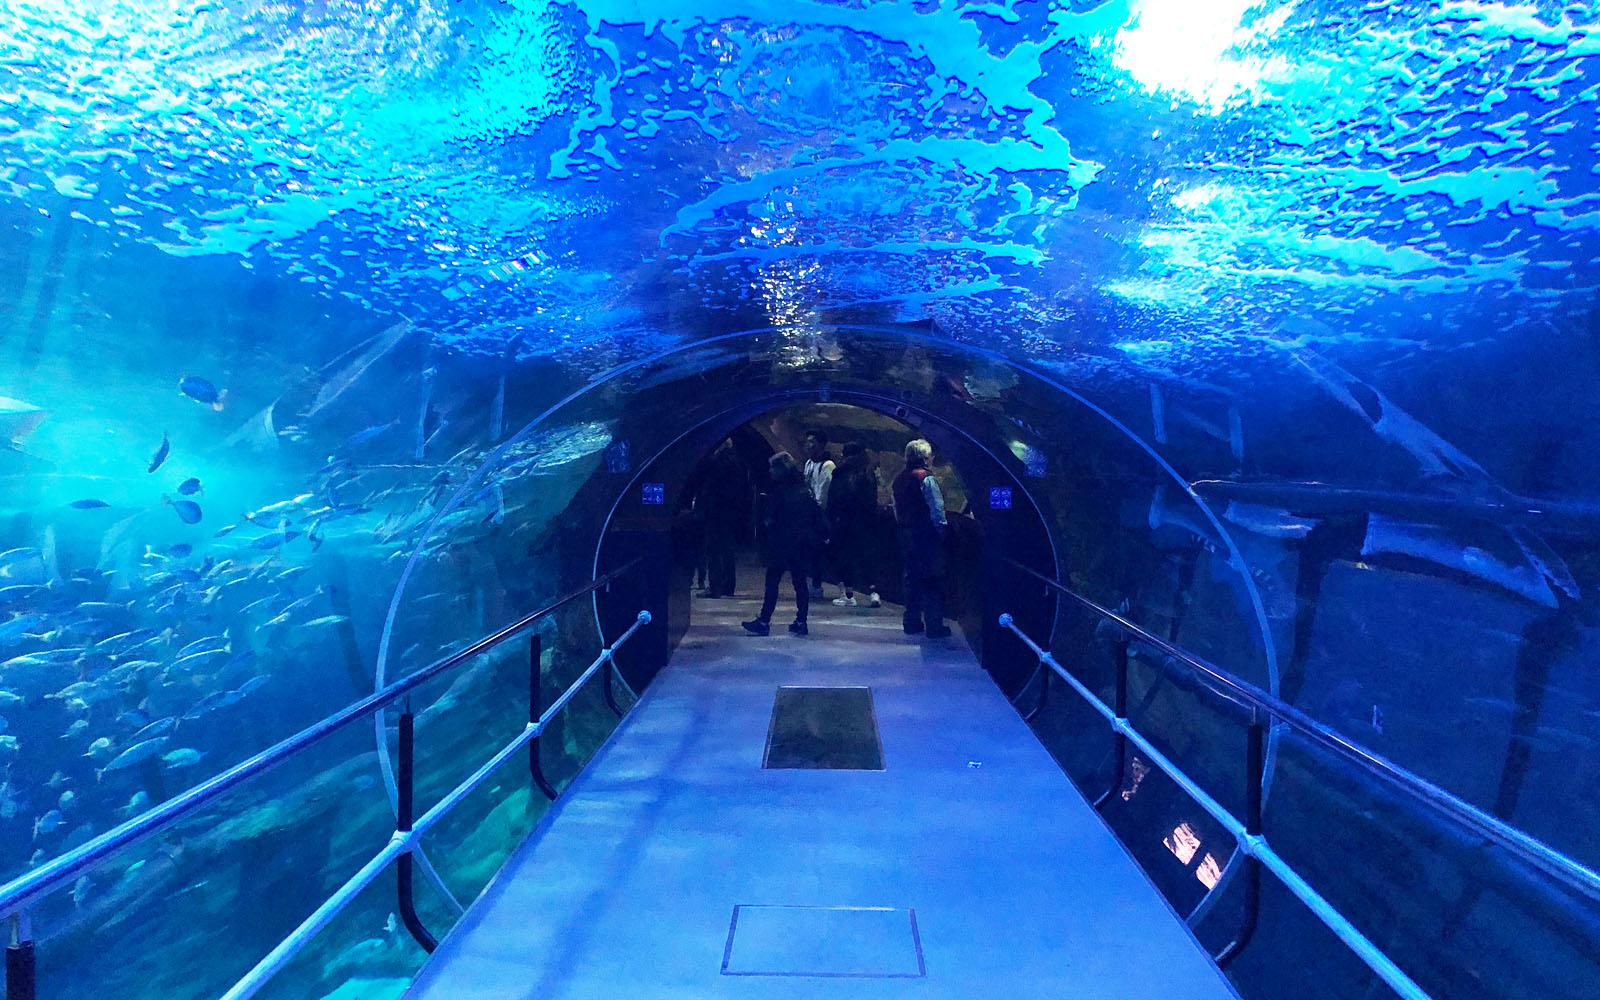 L'Oceanário dell'acquario di San Sebastian